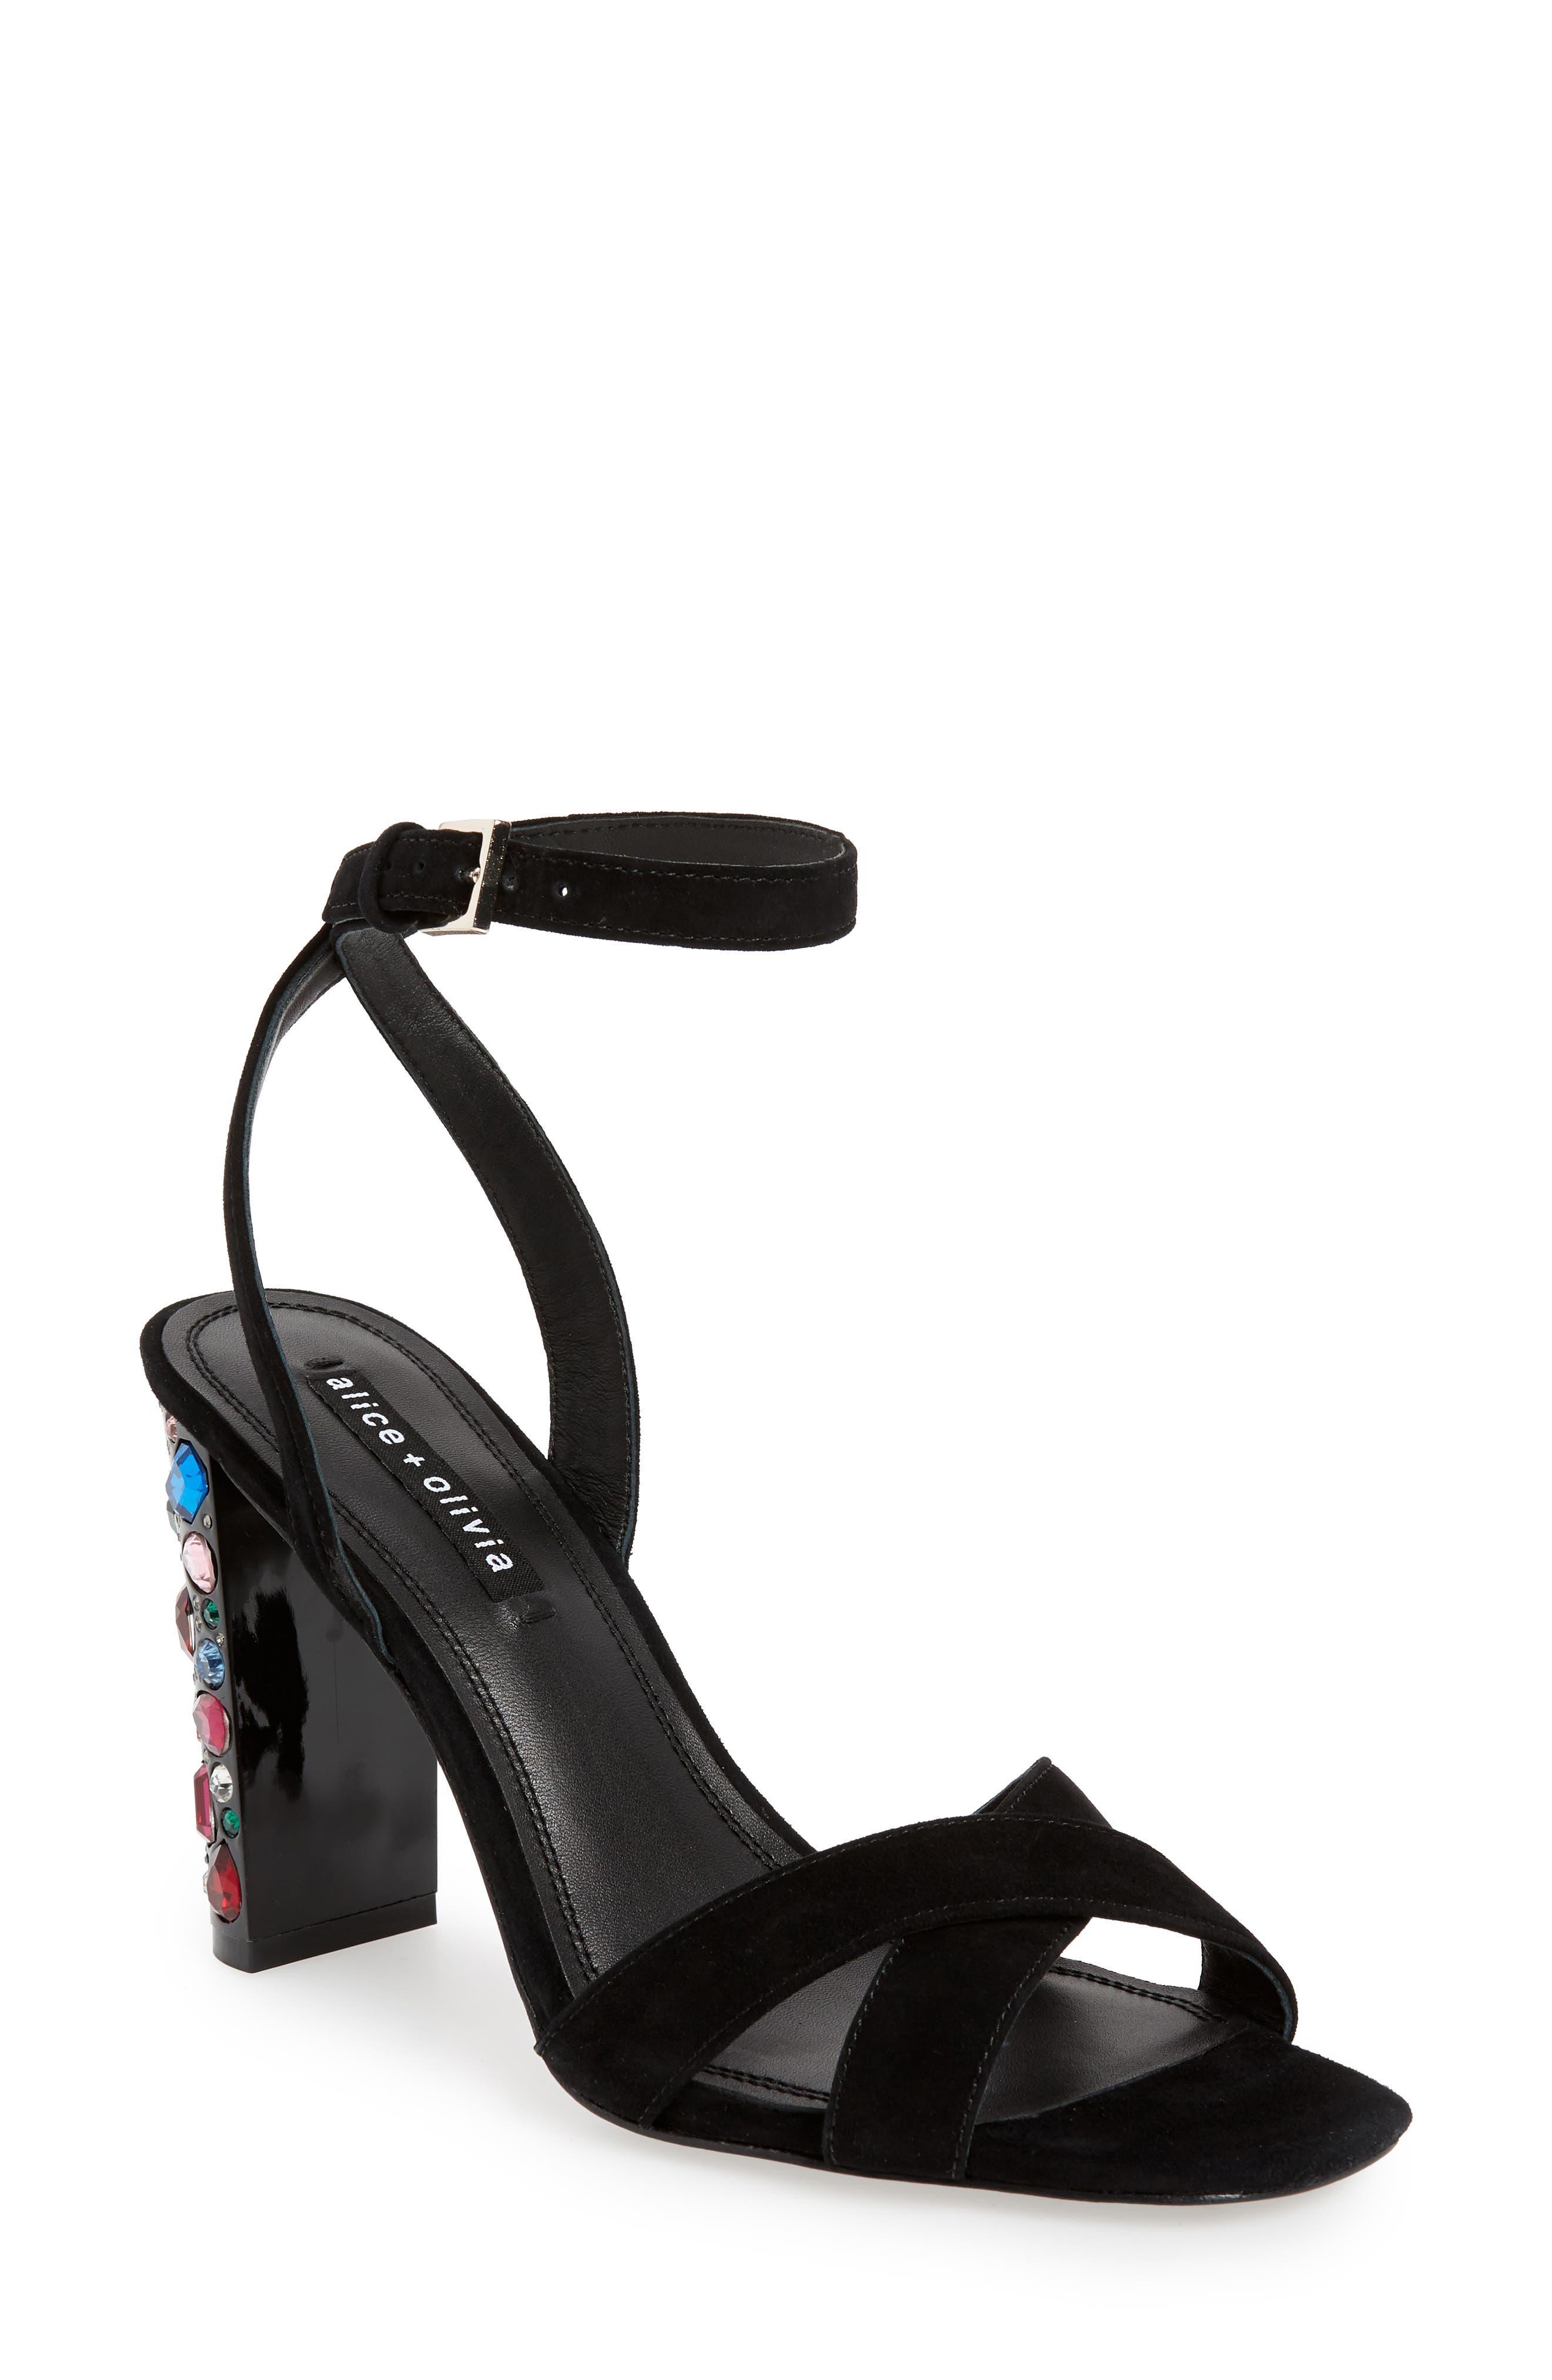 ALICE + OLIVIA Renia Crystal Heel Sandal, Main, color, BLACK